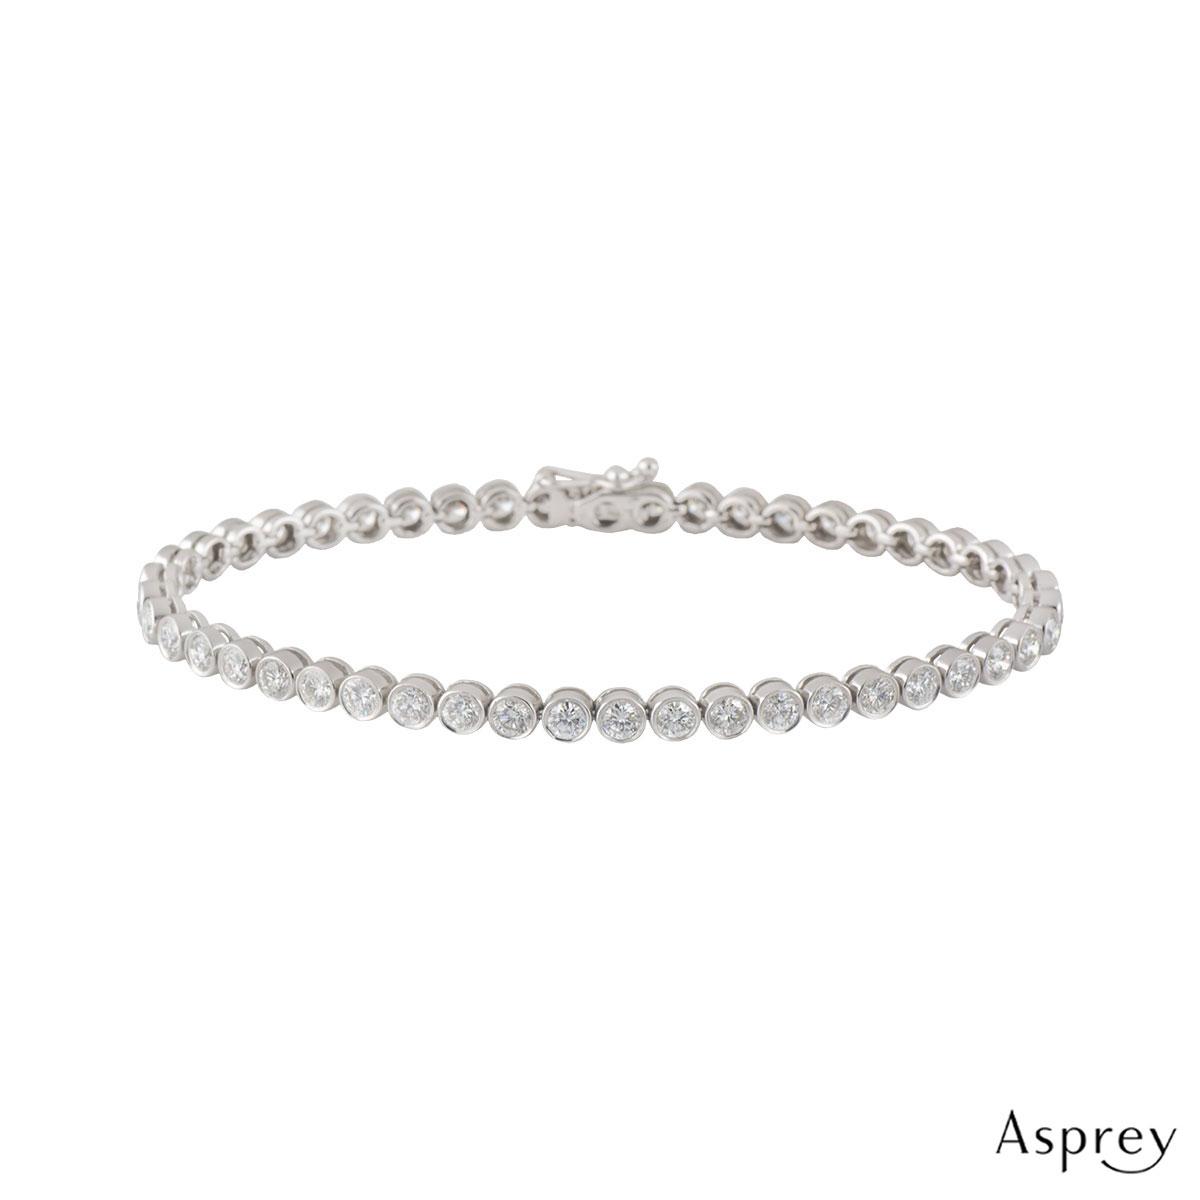 Asprey White Gold Diamond Line Bracelet 4.70ct G-H/VS1